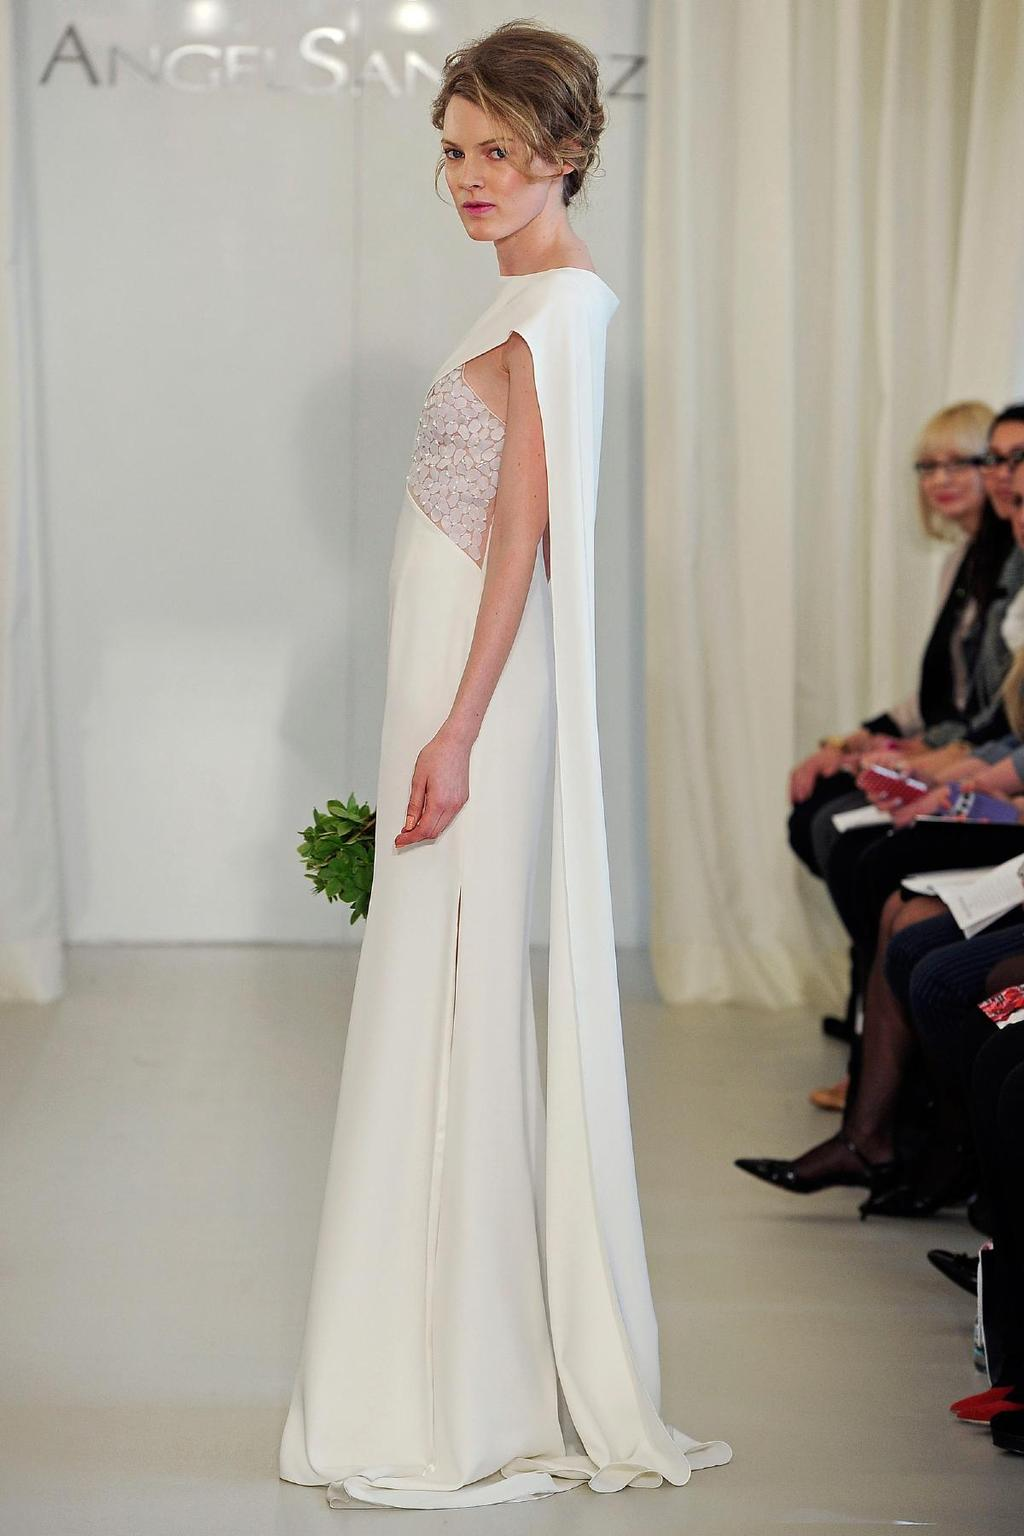 Angel-sanchez-wedding-dress-spring-2014-bridal-15.full